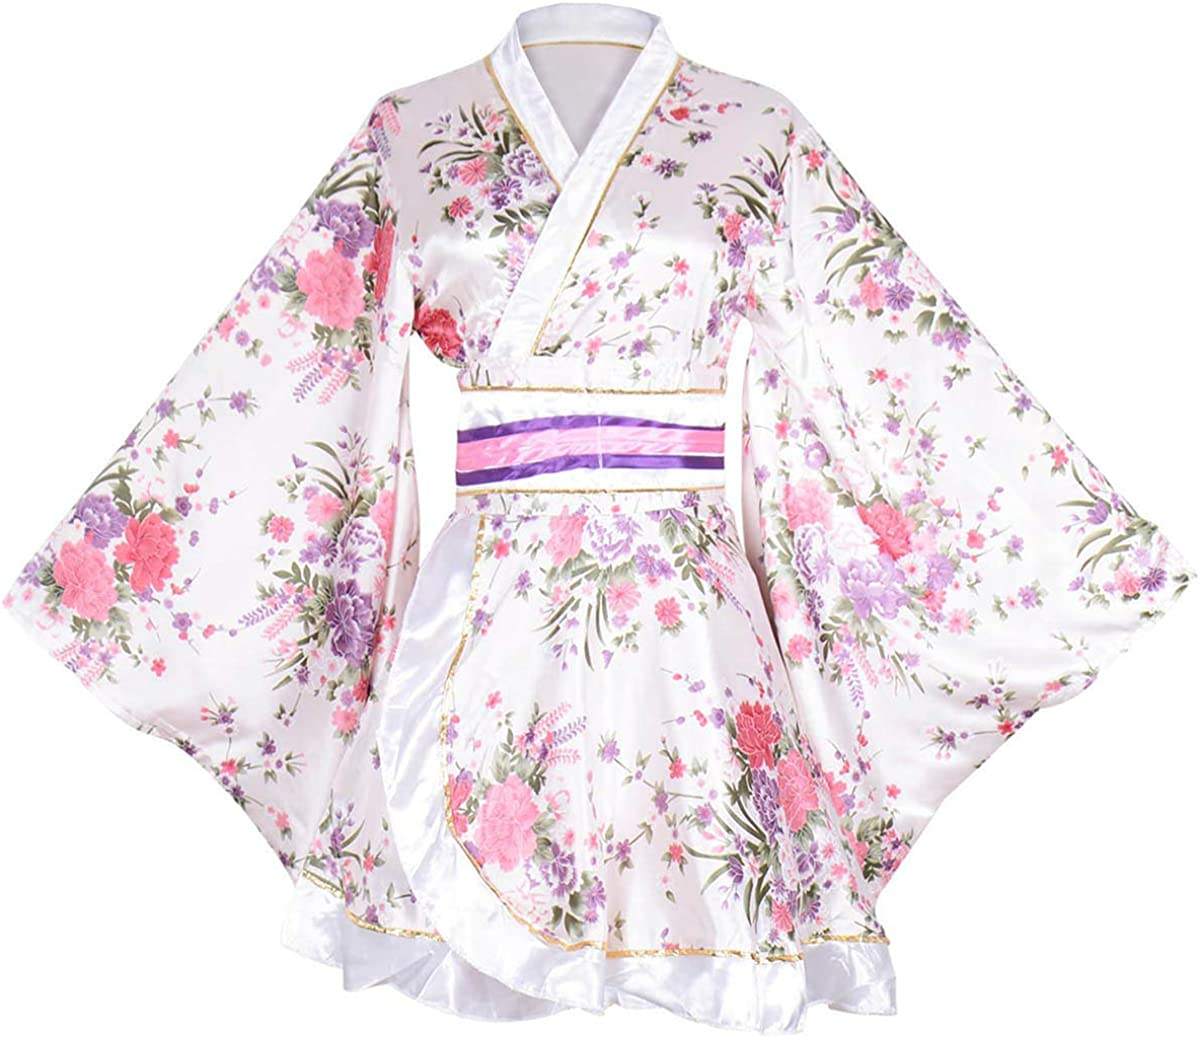 Amazon.com: Kimono de mujer para adultos, japonés, con ...